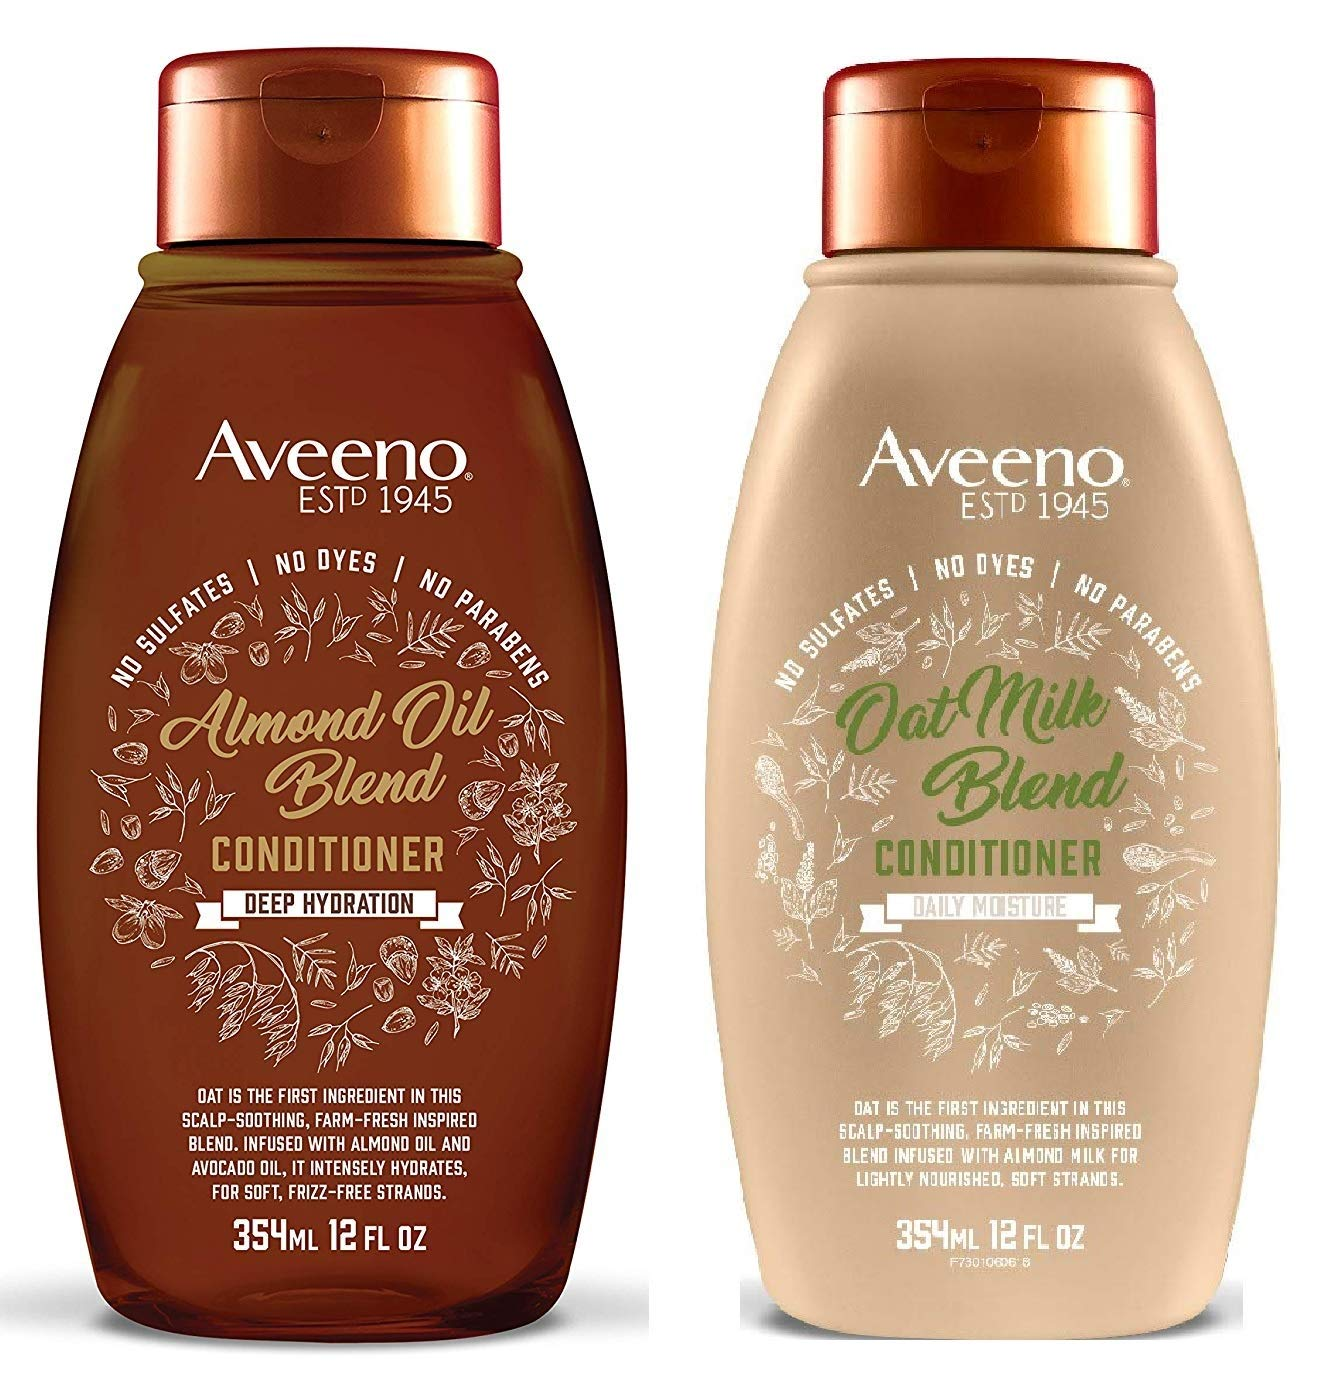 Almond Oil Blend Conditioner & Oat Milk Blend Conditioner (12 fl. oz Each) - Set of 2